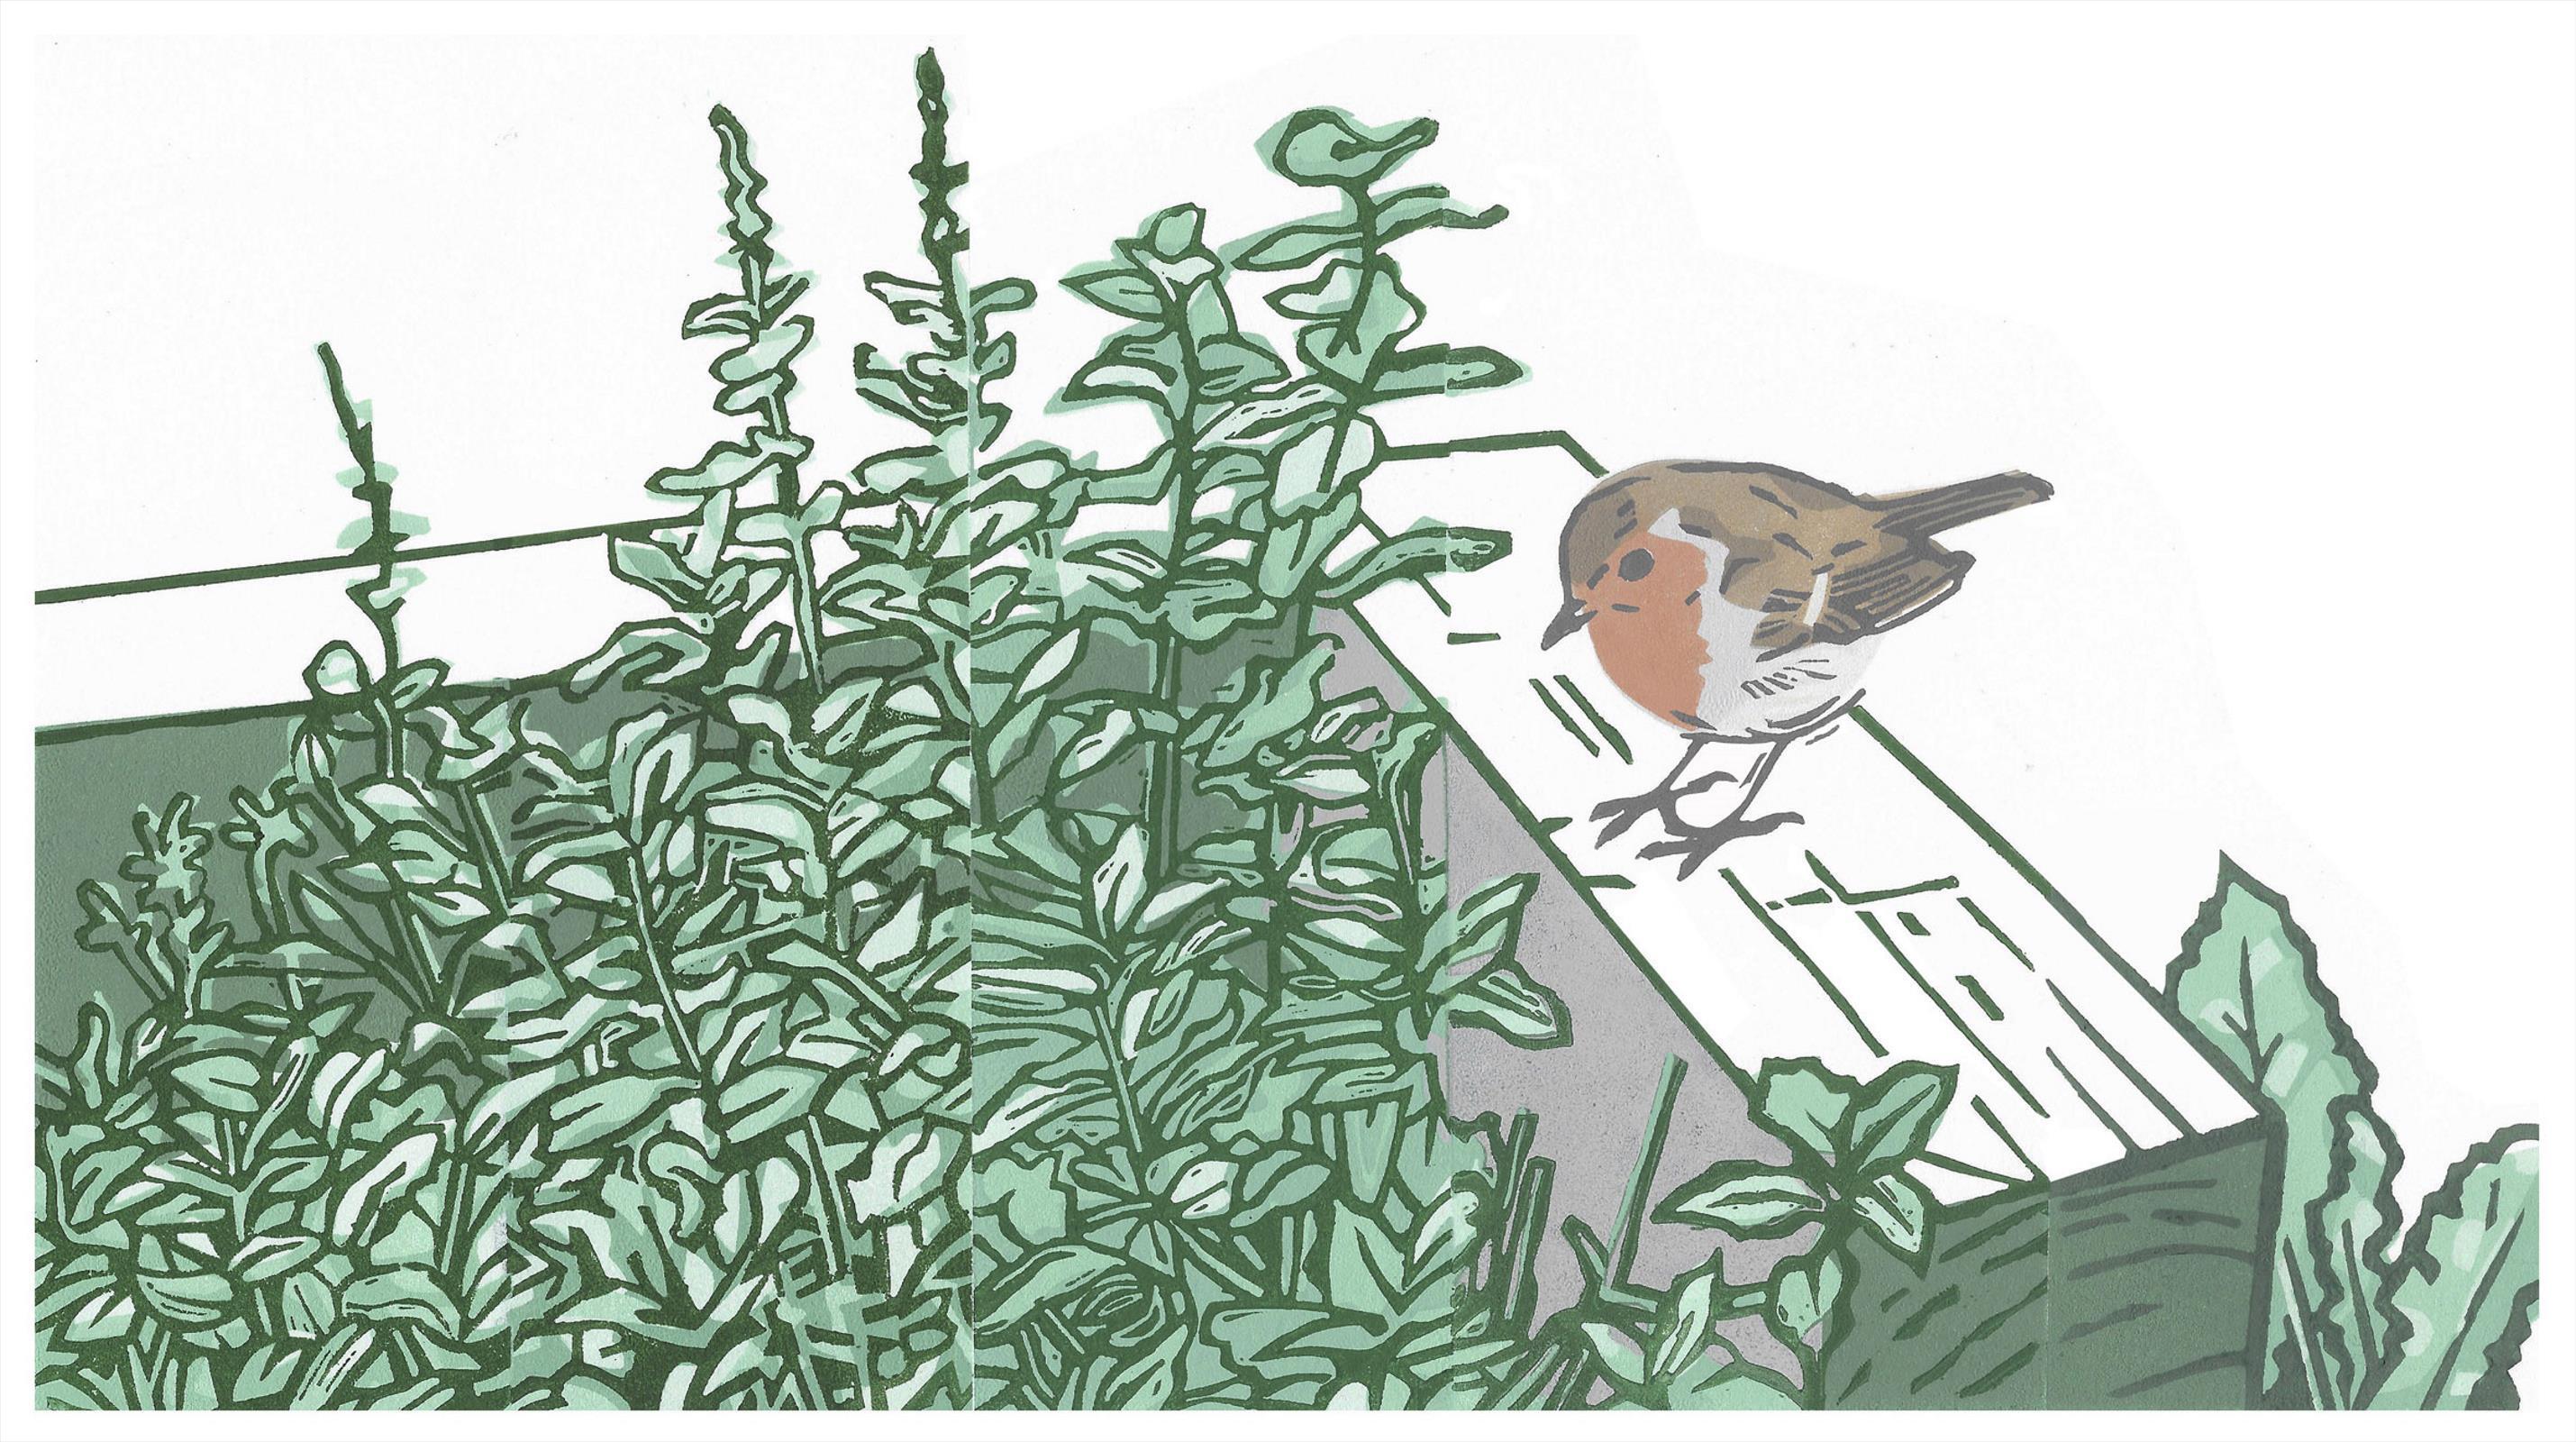 <p>Garden Guardian by Chris Sinden</p>